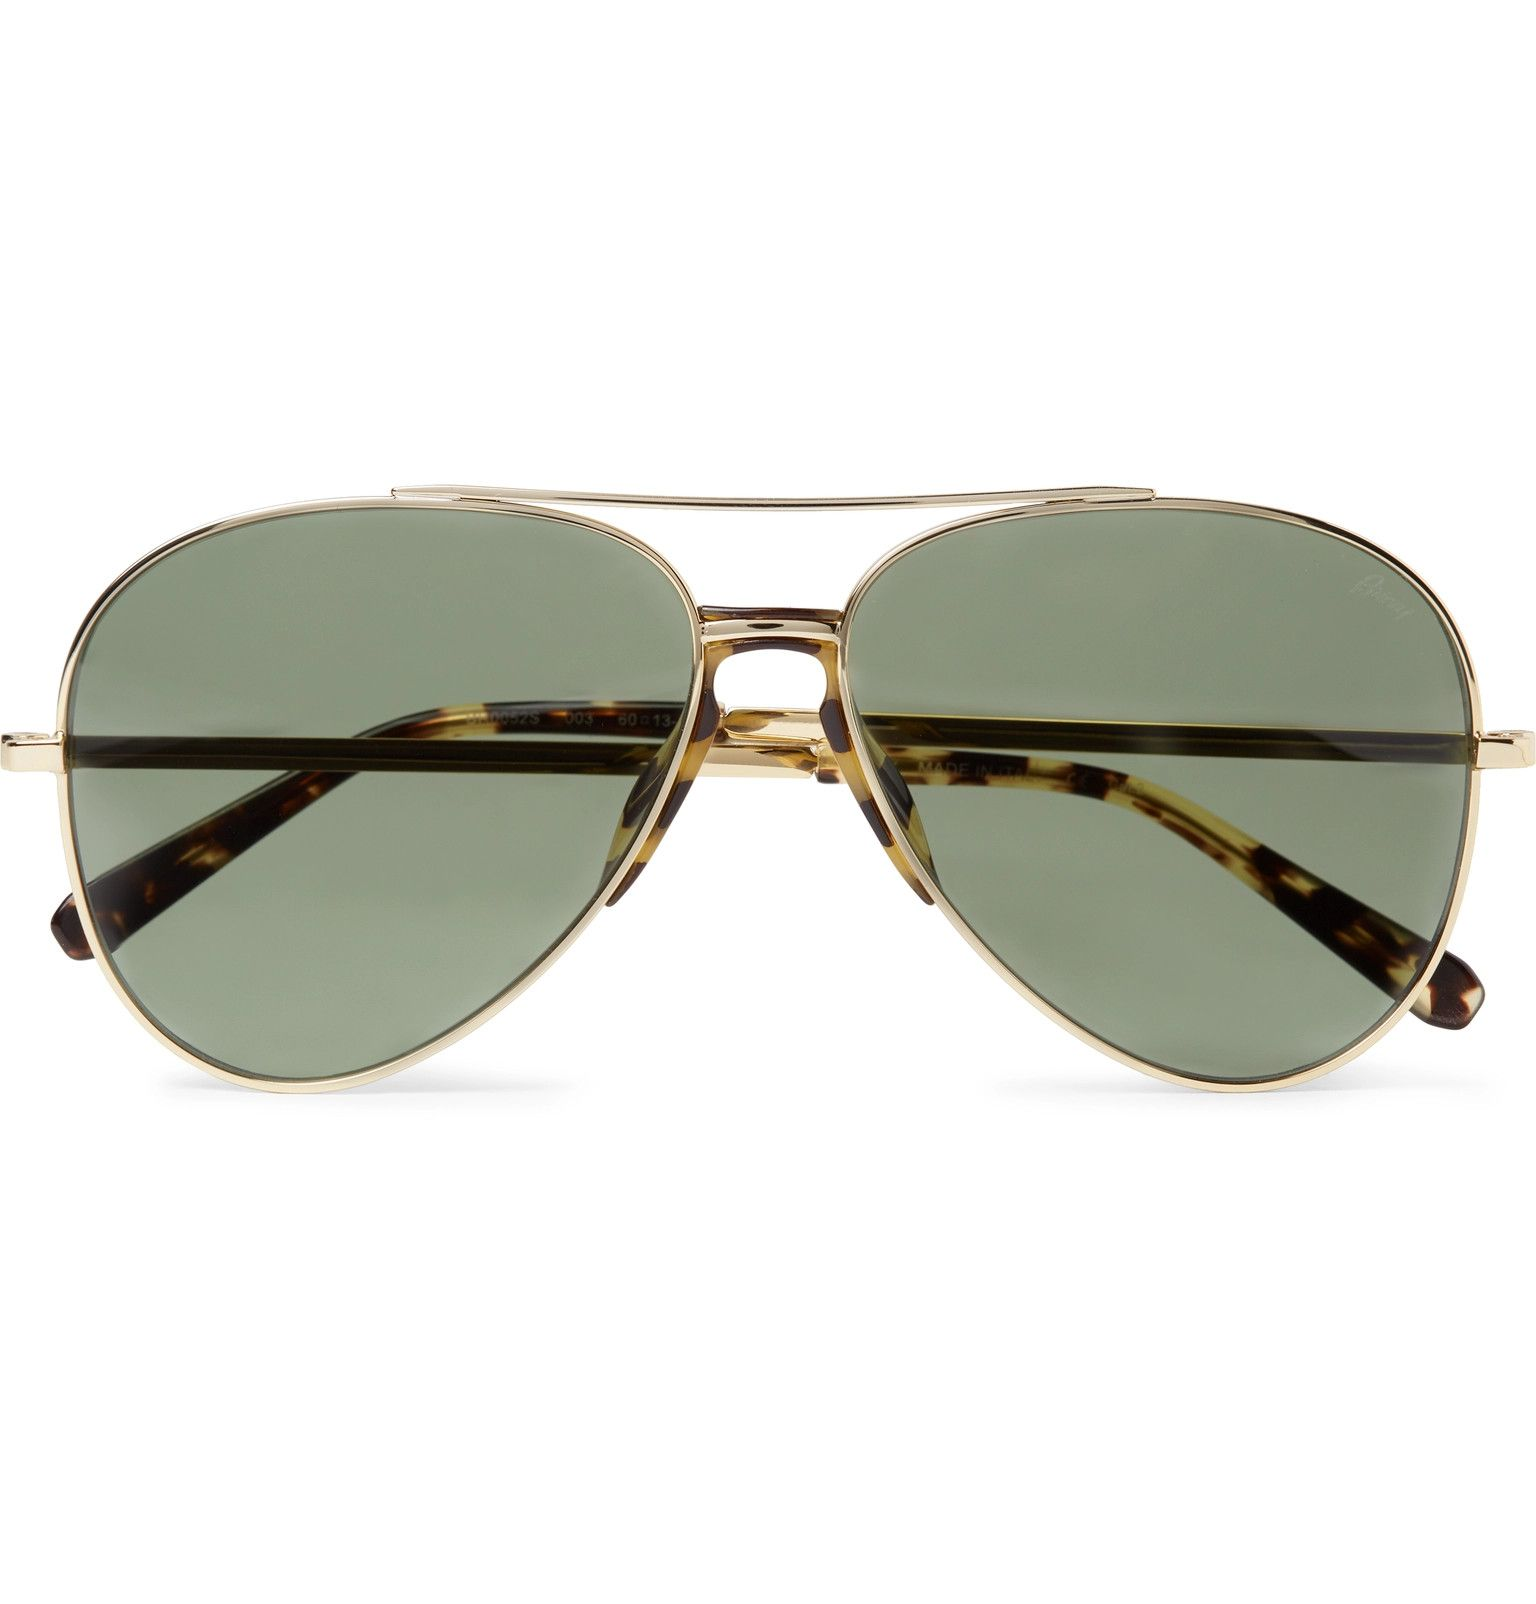 5bfb6476db Brioni - Aviator-Style Tortoiseshell Acetate-Trimmed Gold-Tone Sunglasses